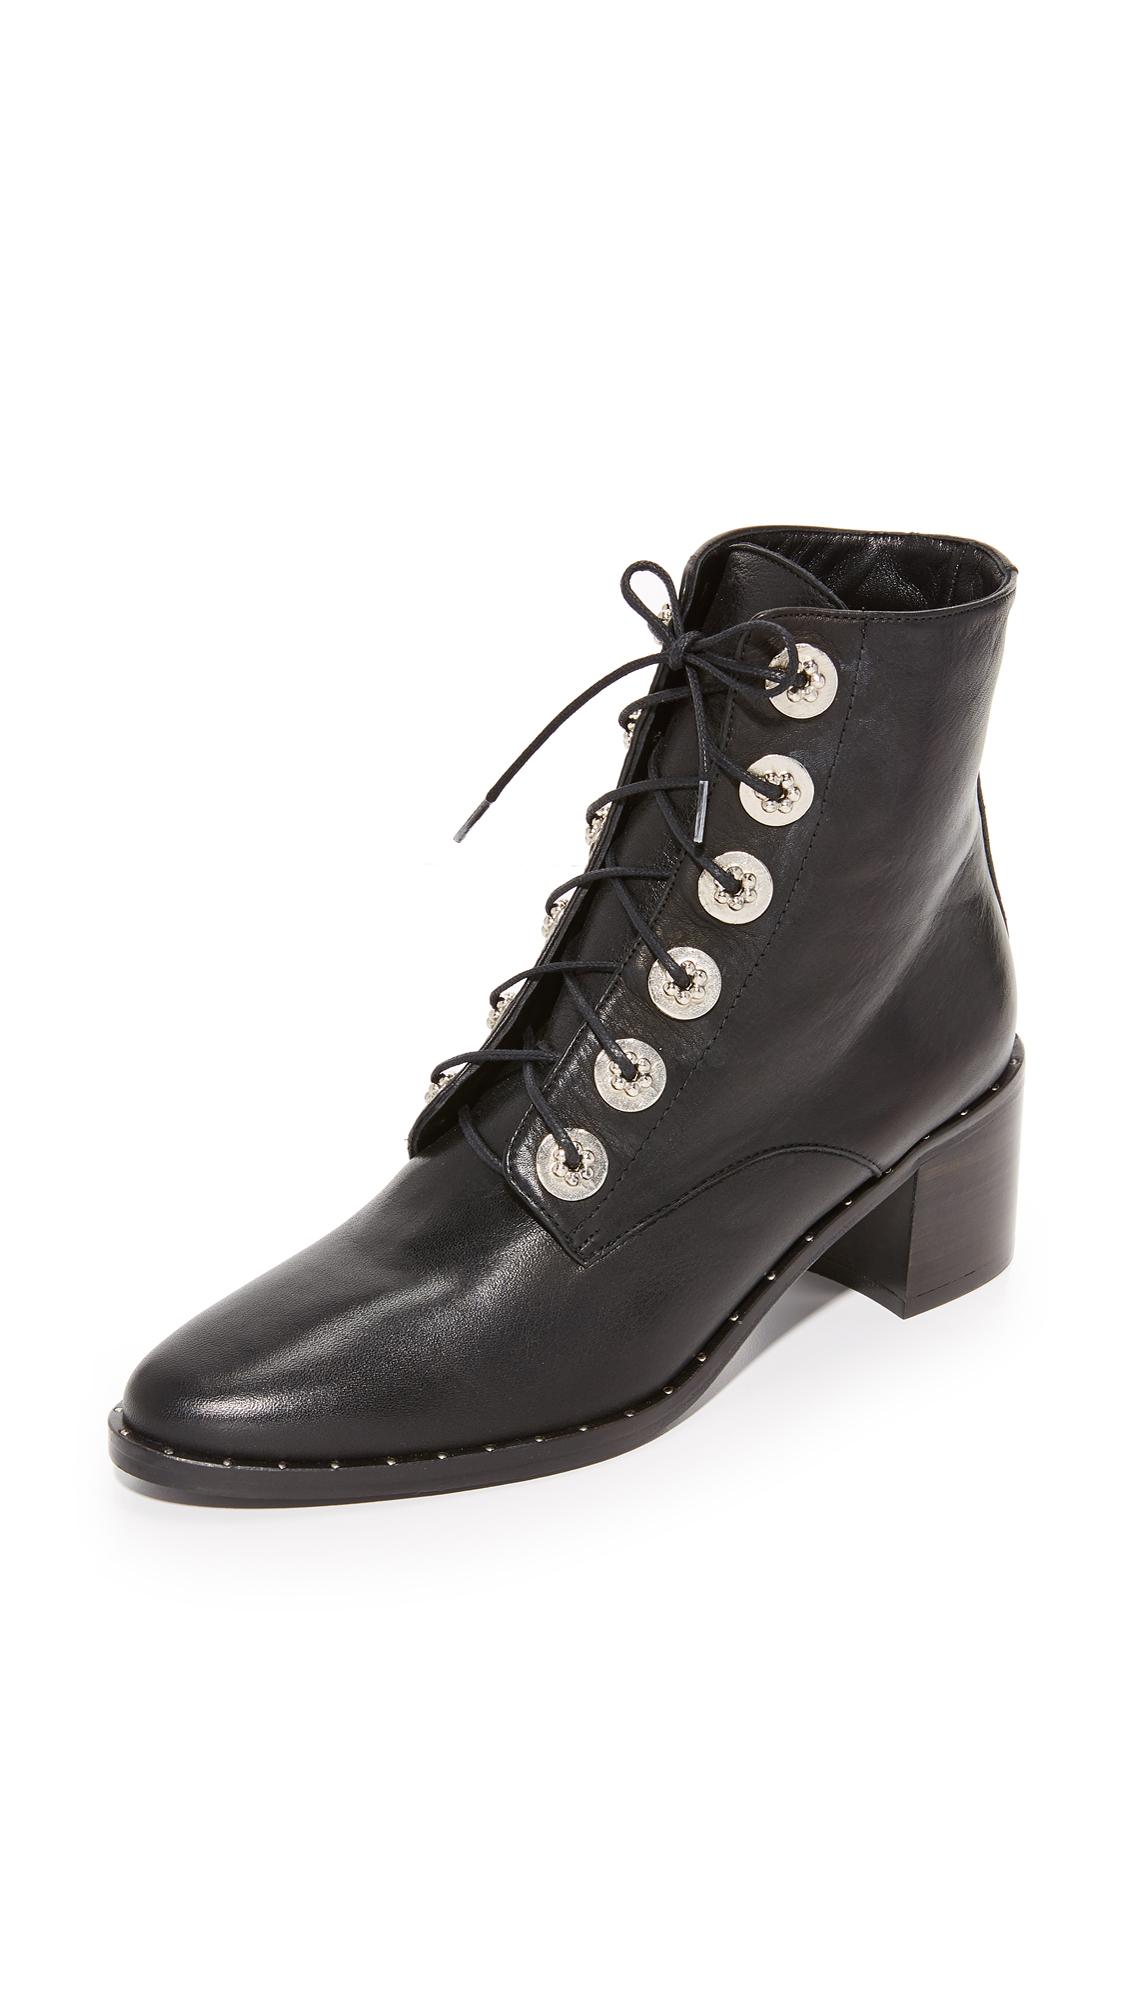 Freda Salvador FS x Anndra Neen Ace Boots - Black